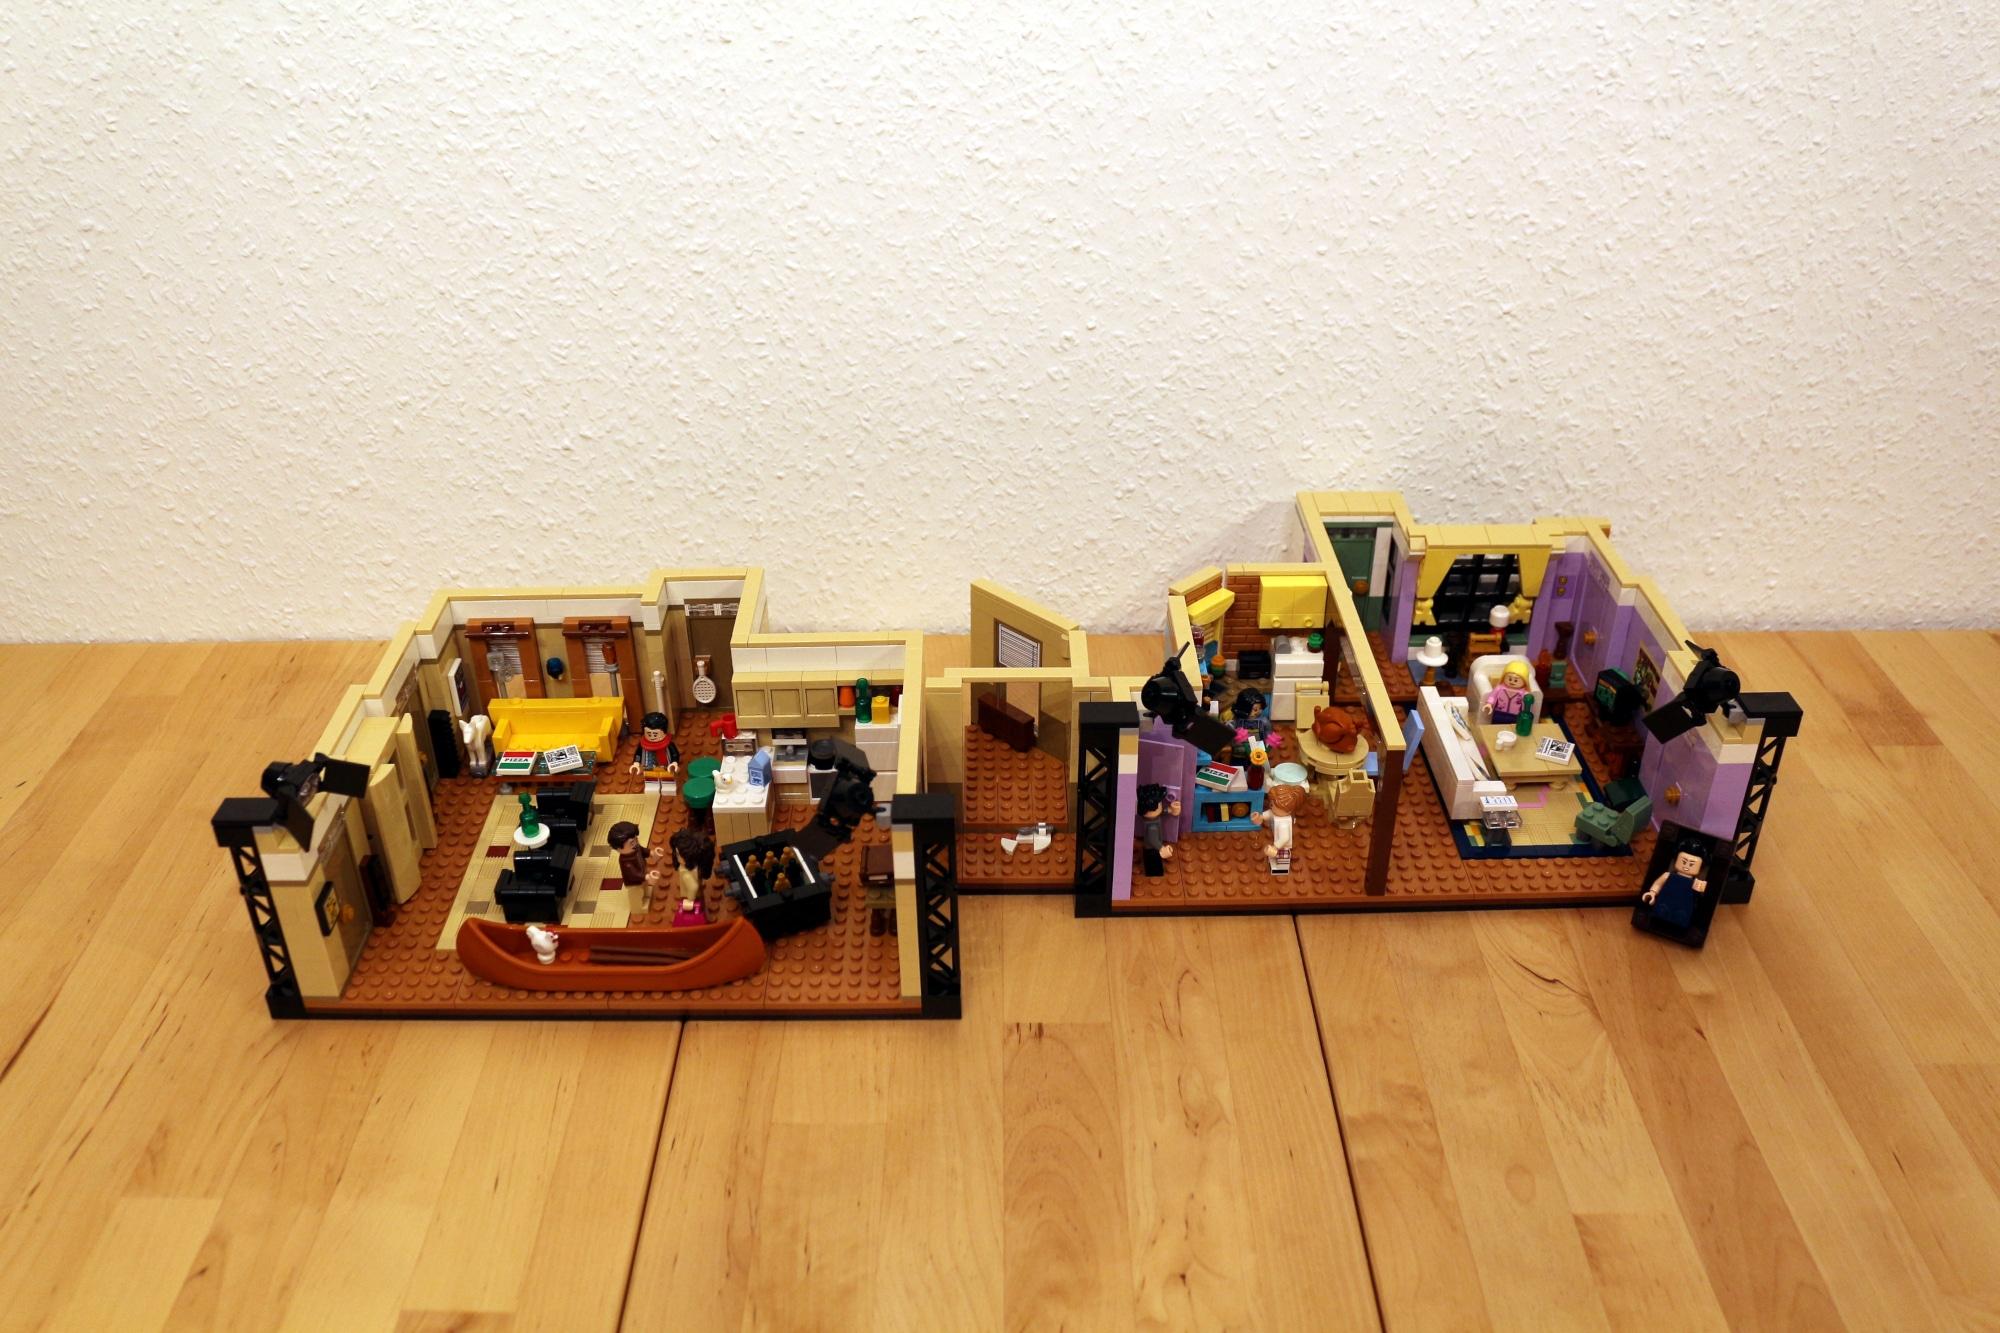 LEGO Friends 10292 The Friends Apartments 74